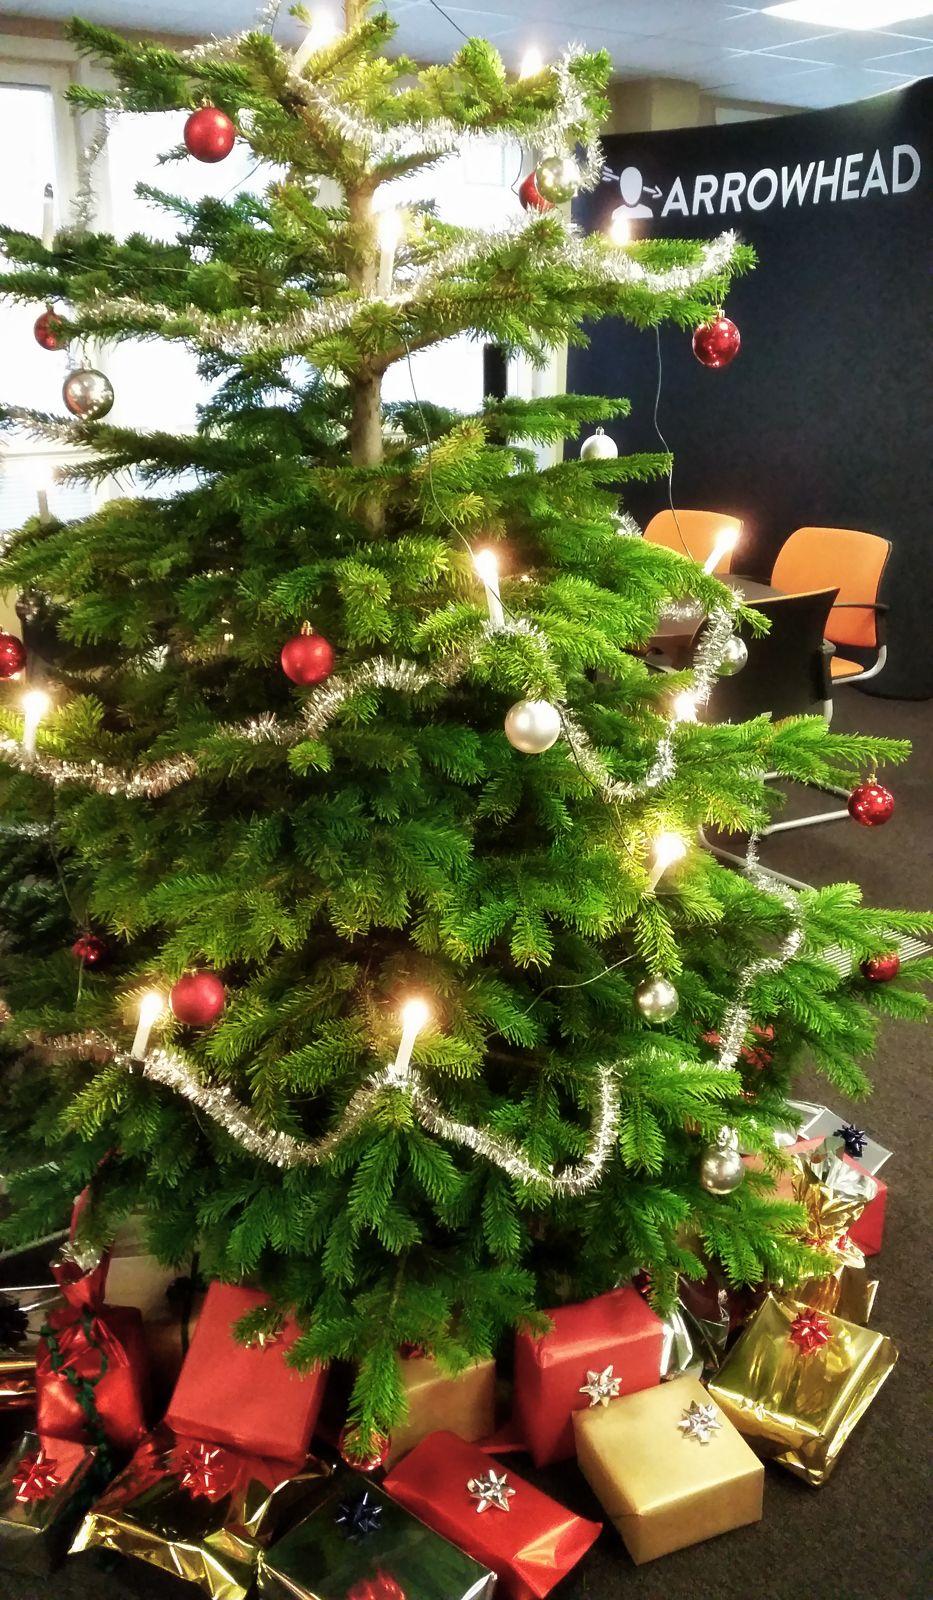 Arrowhead Christmas Tree